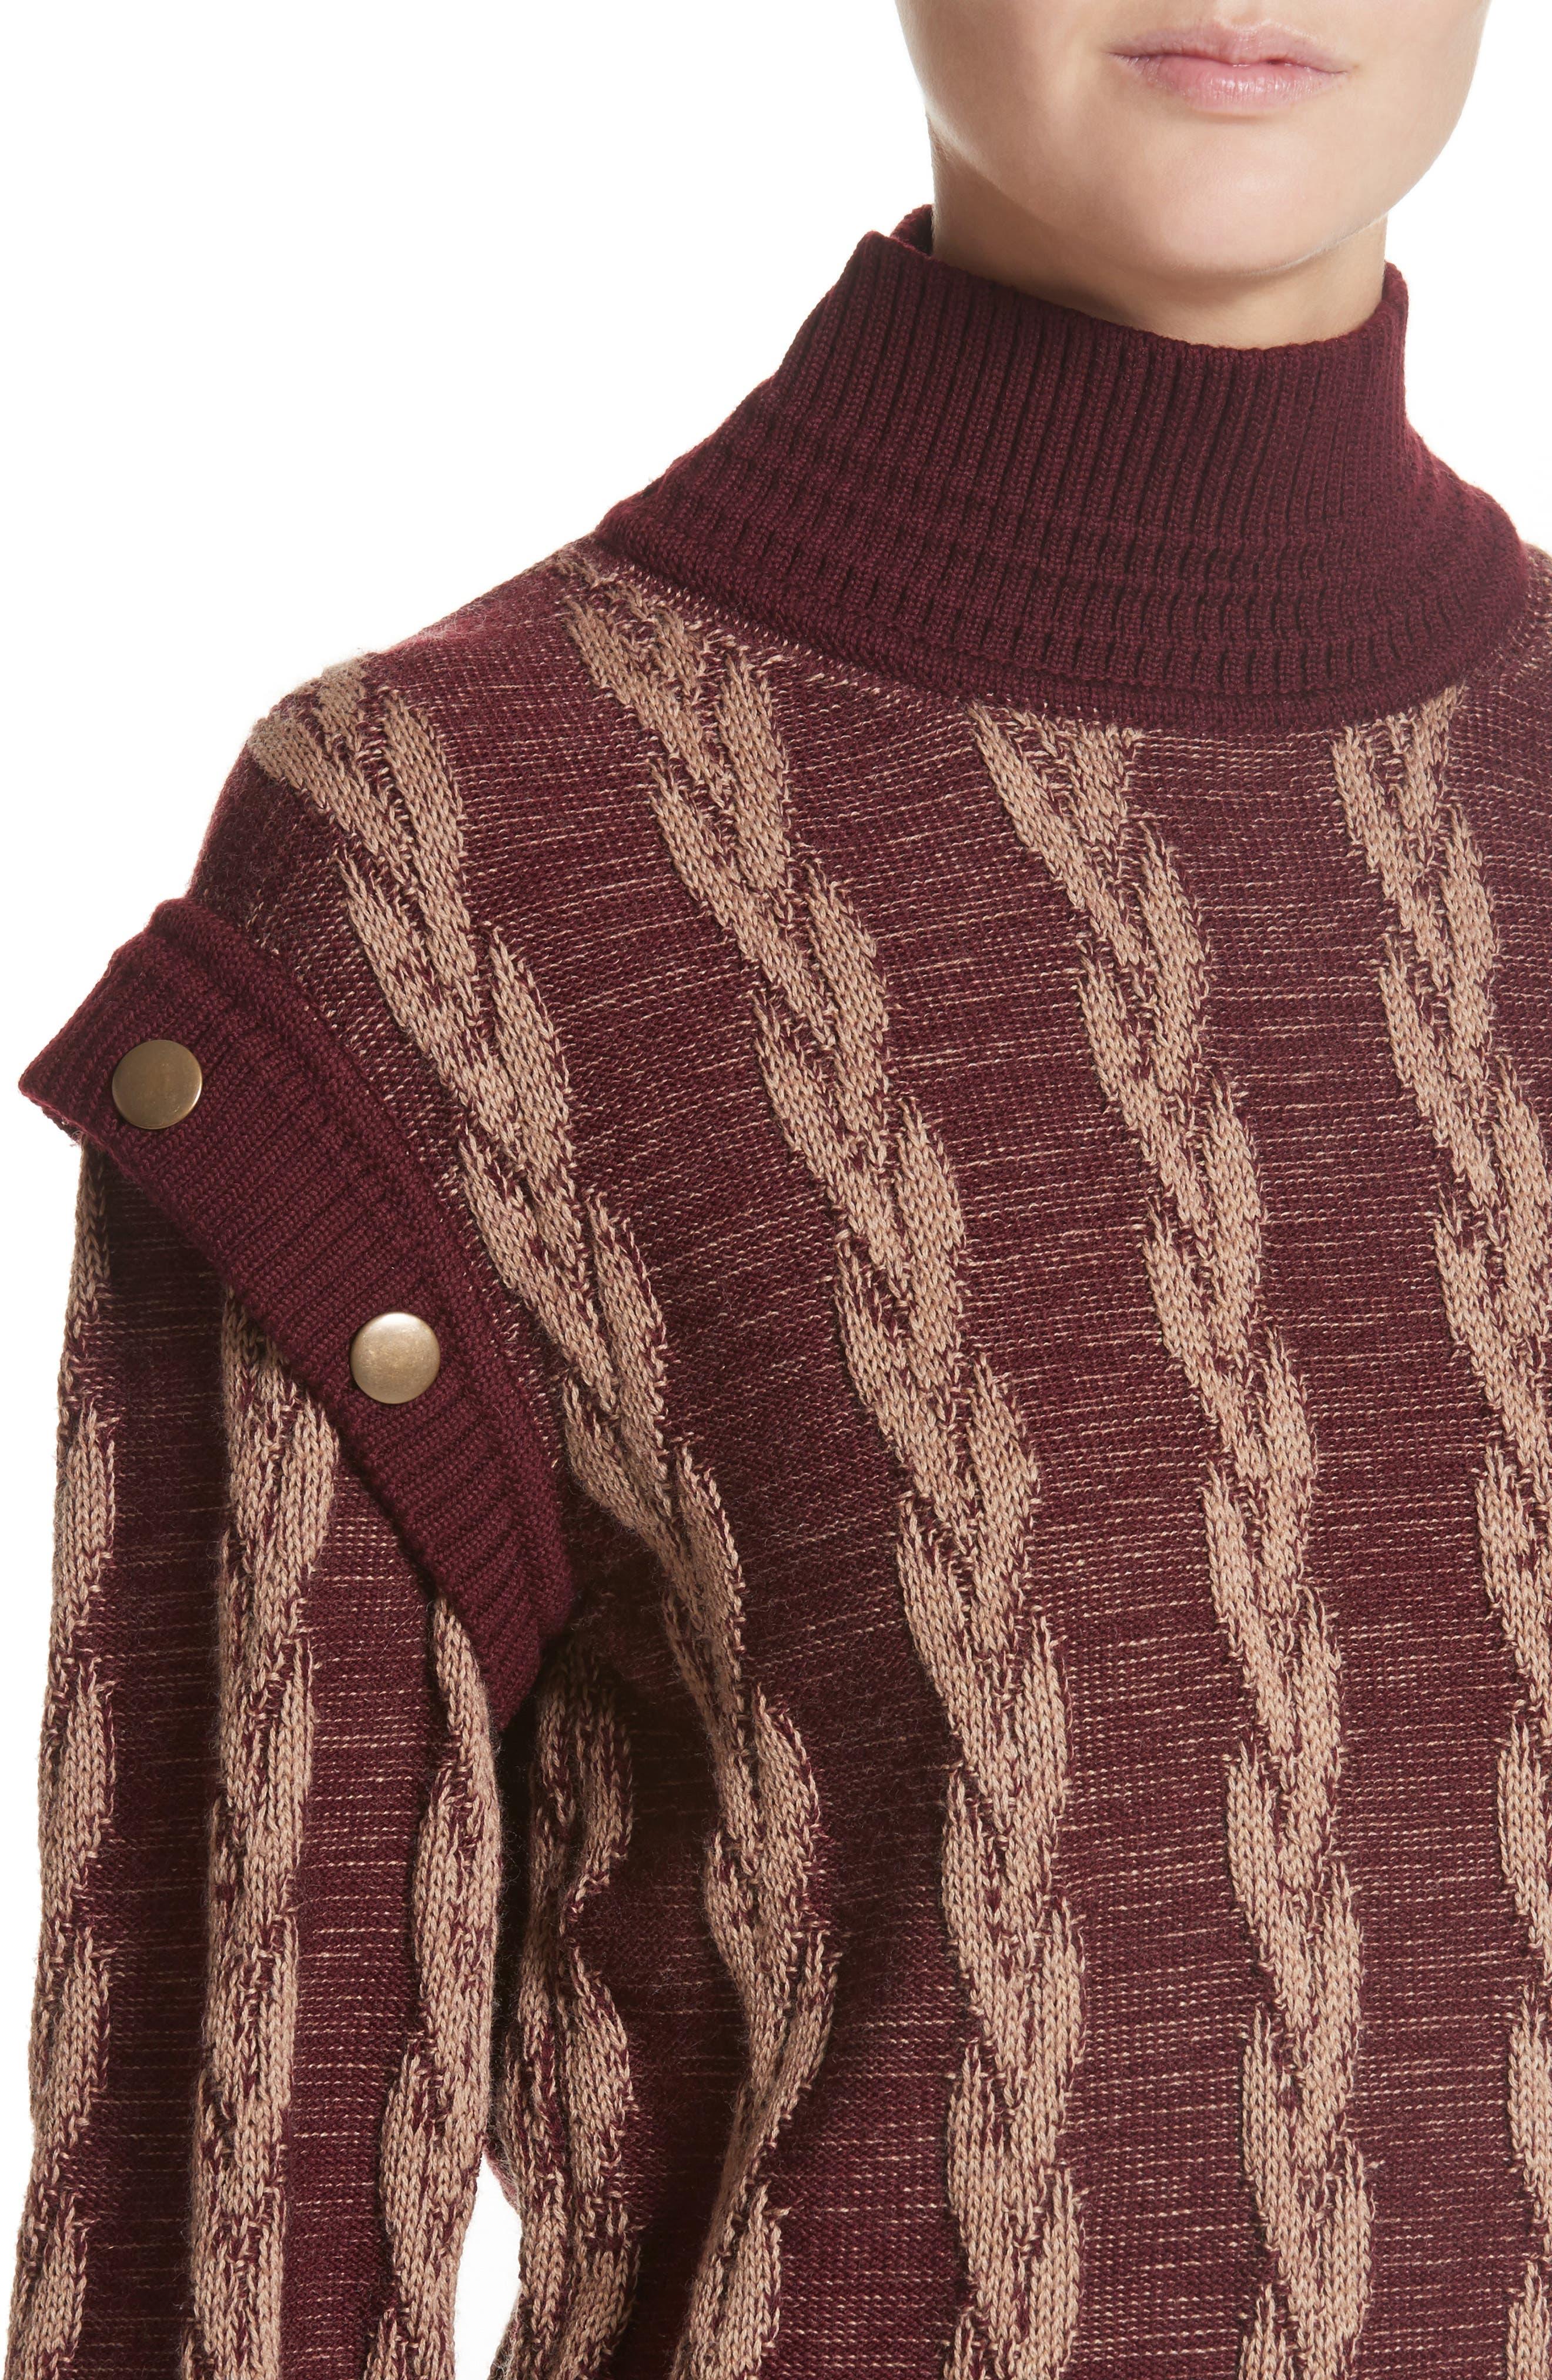 Cable Knit Turtleneck Sweater,                             Alternate thumbnail 4, color,                             930